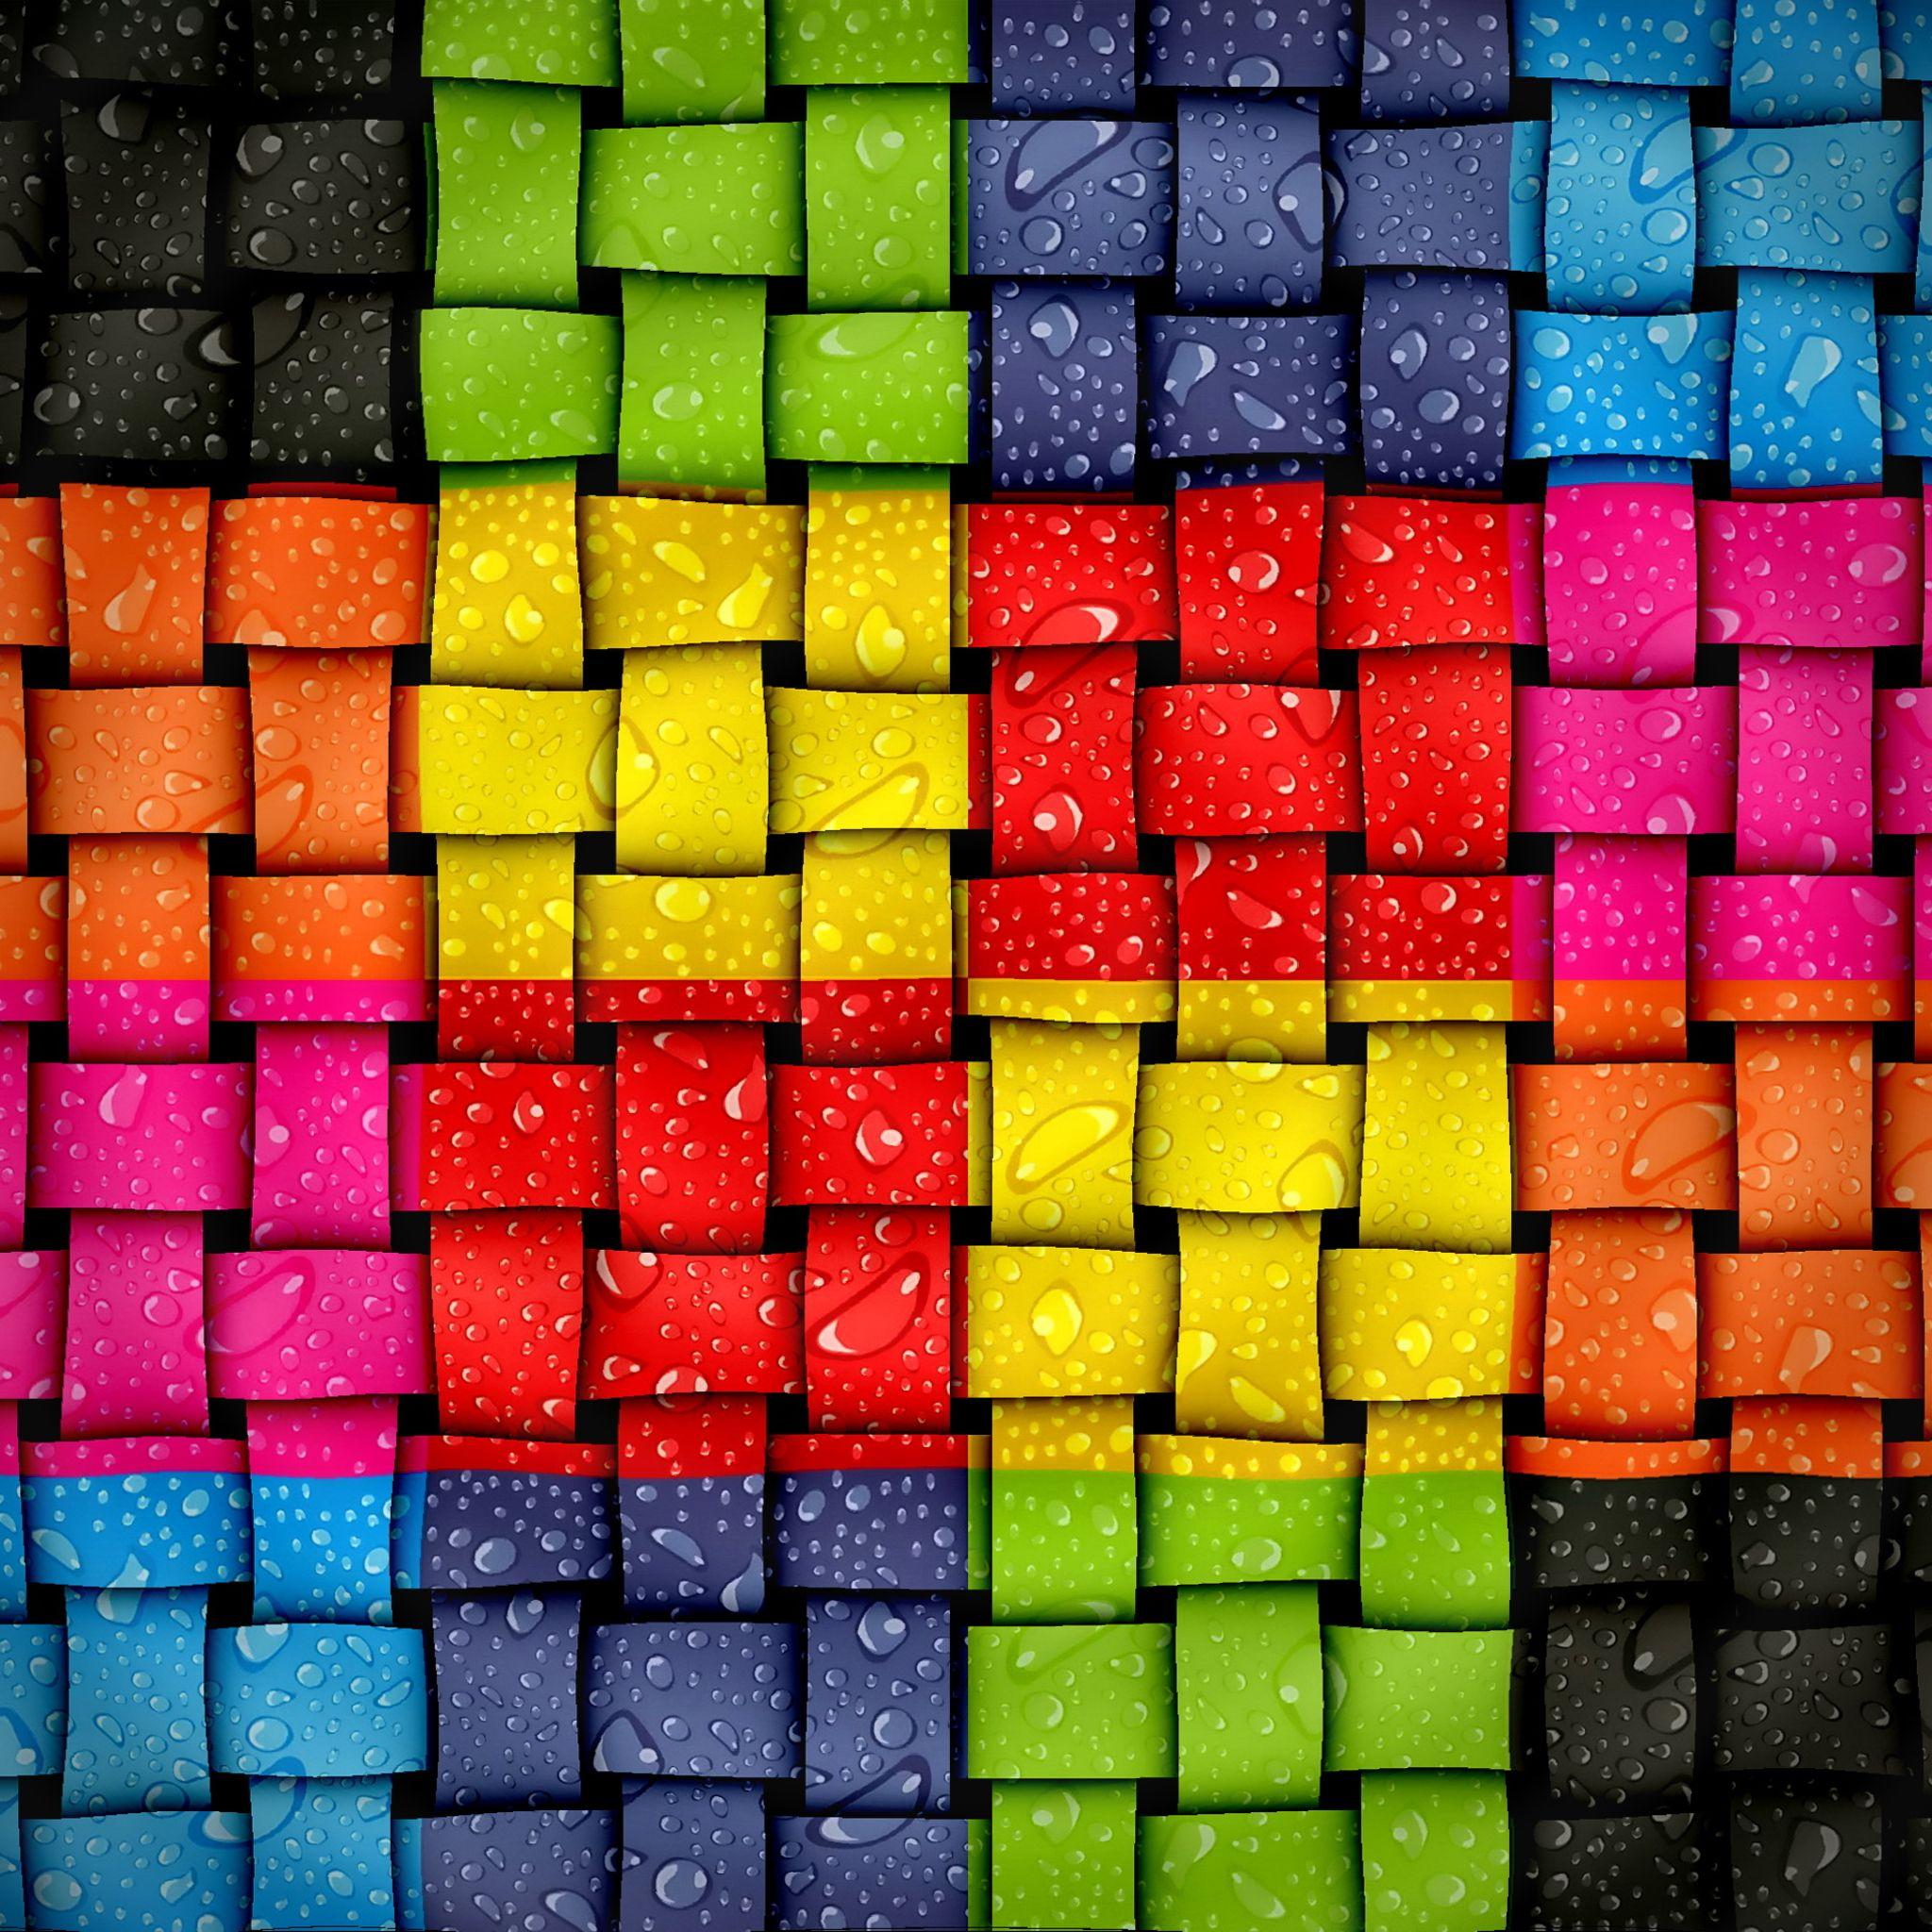 احدث خلفيات ايباد 2013 Http Www Ahlalayla Com D8 A7 D8 Ad D8 Af D8 Ab D8 Ae D9 84 D9 81 D9 8a D8 A7 D8 A Ipad Image Ipad Air 2 Wallpaper Colorful Wallpaper